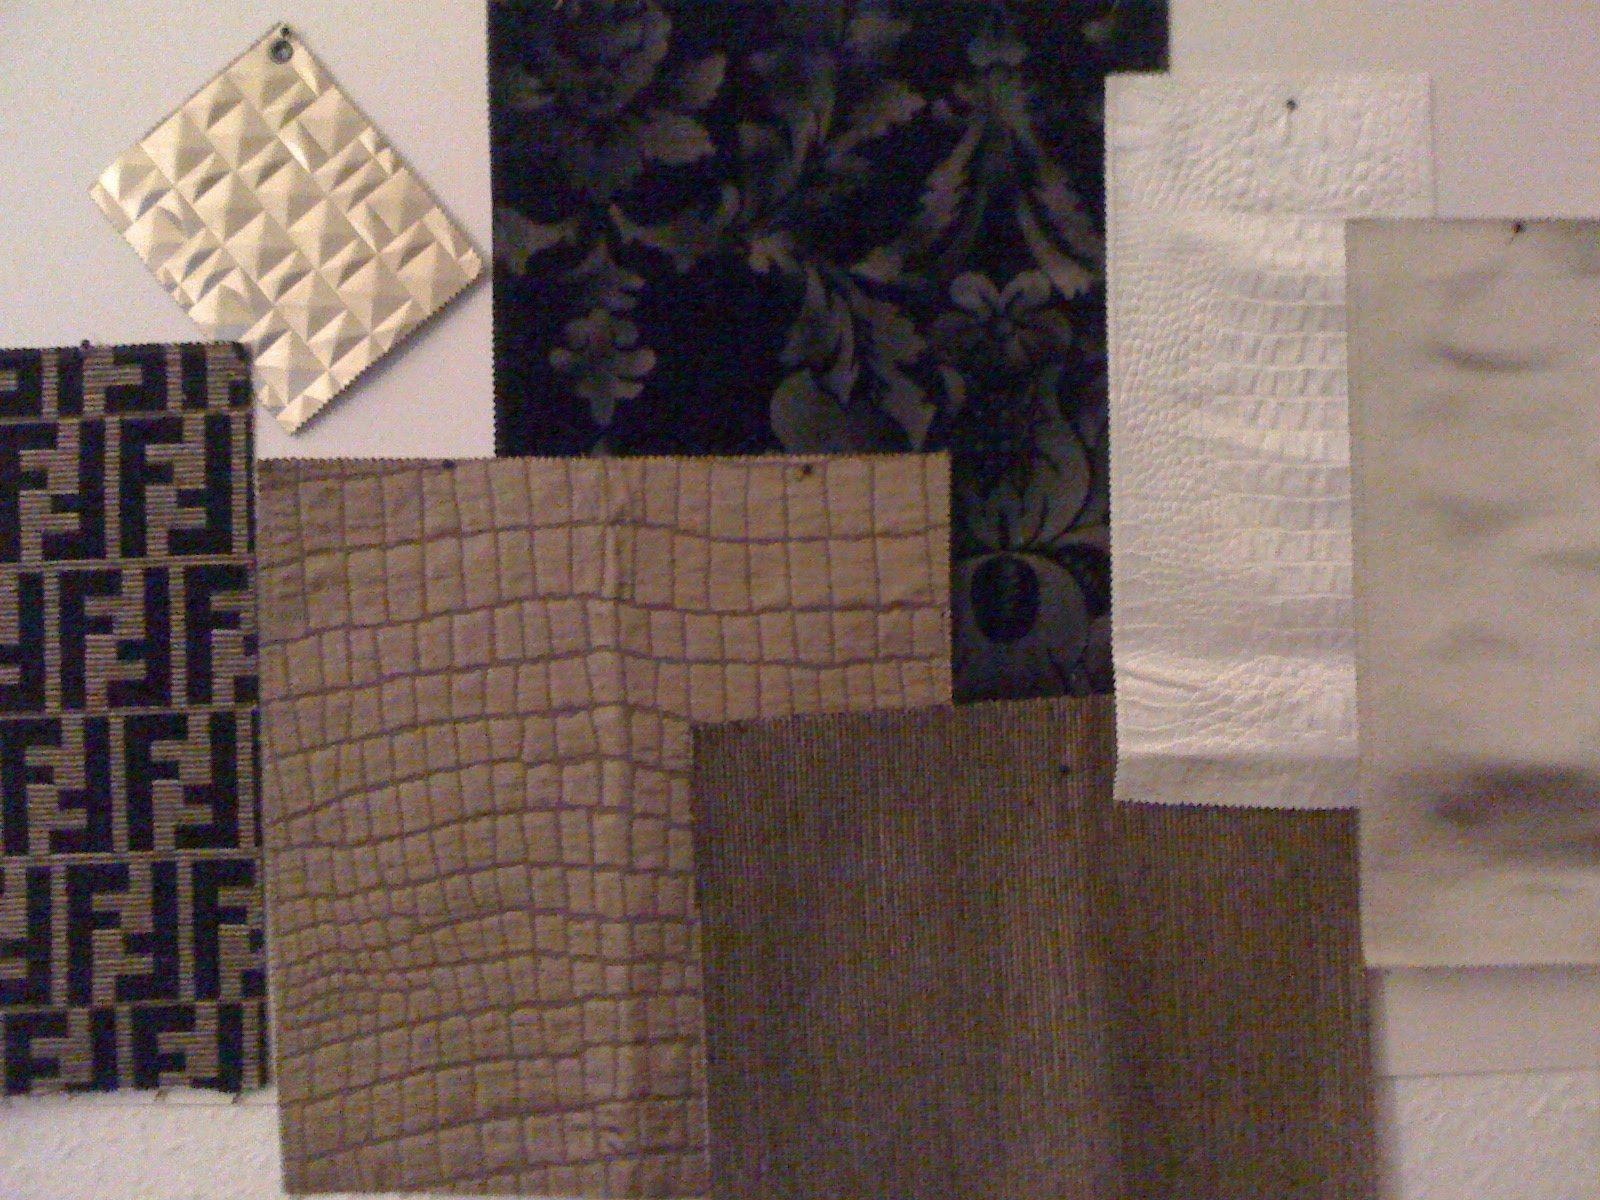 aab677c7f7a1 Fendi Casa fabrics